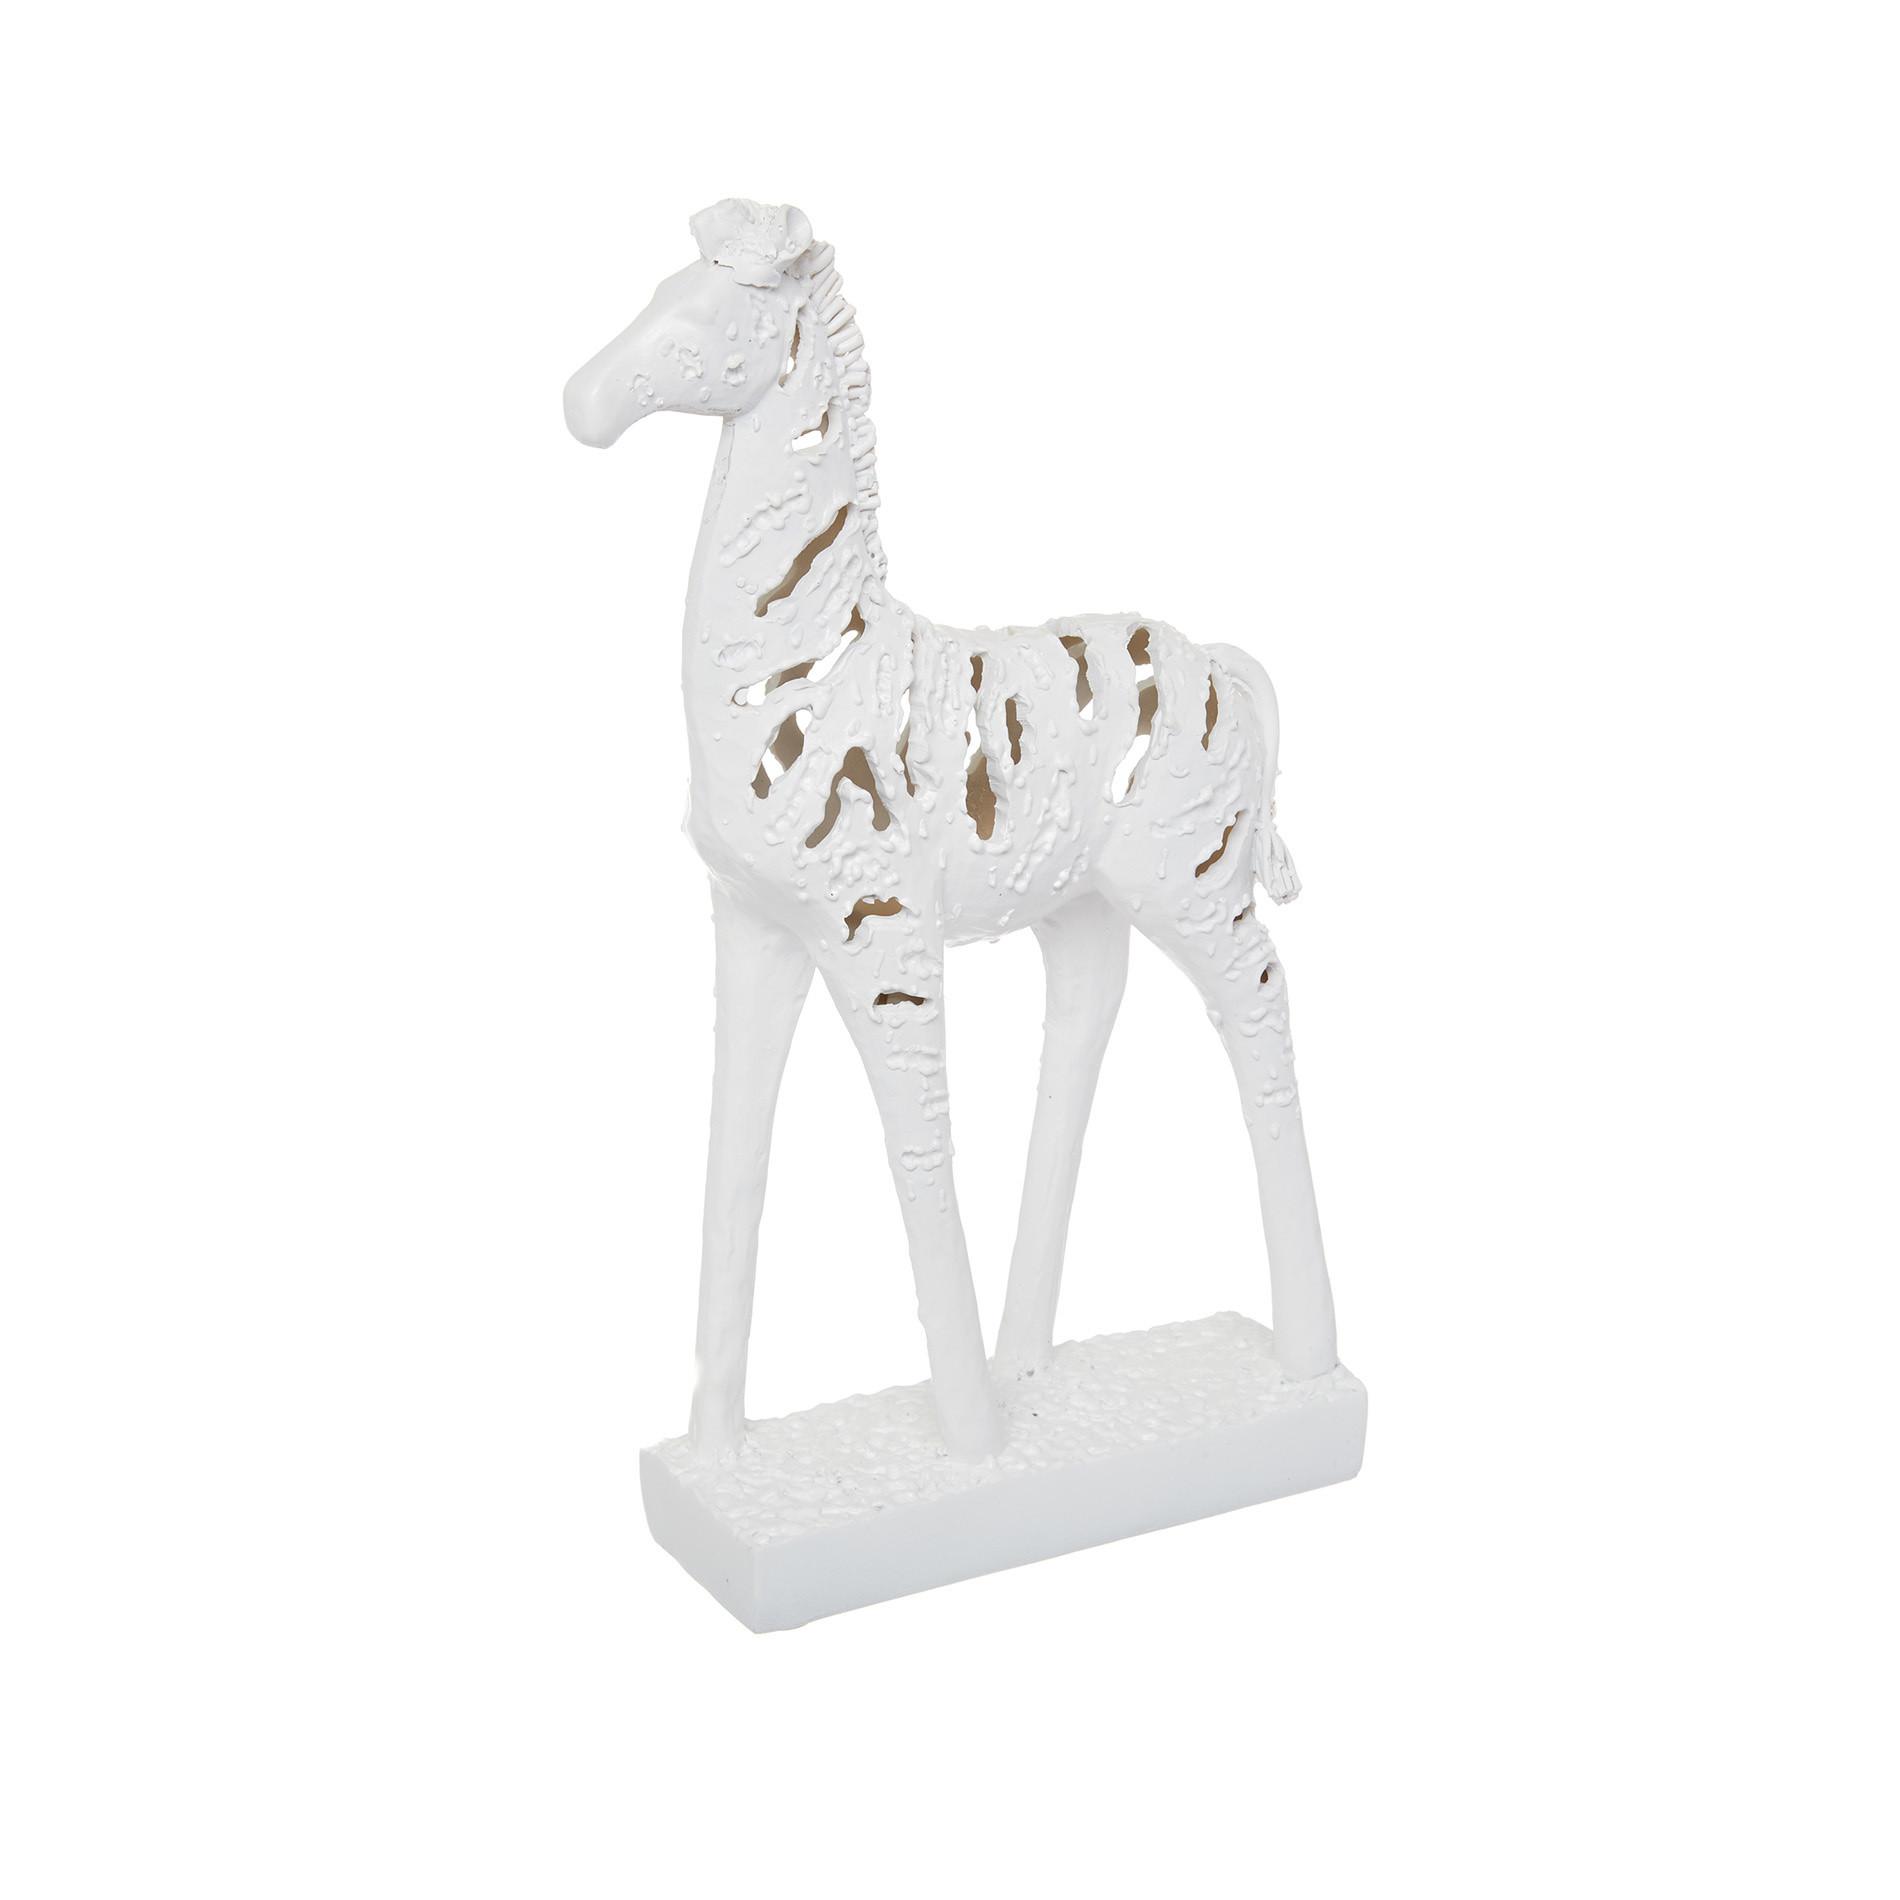 Zebra decorativa rifinita a mano, Bianco, large image number 0